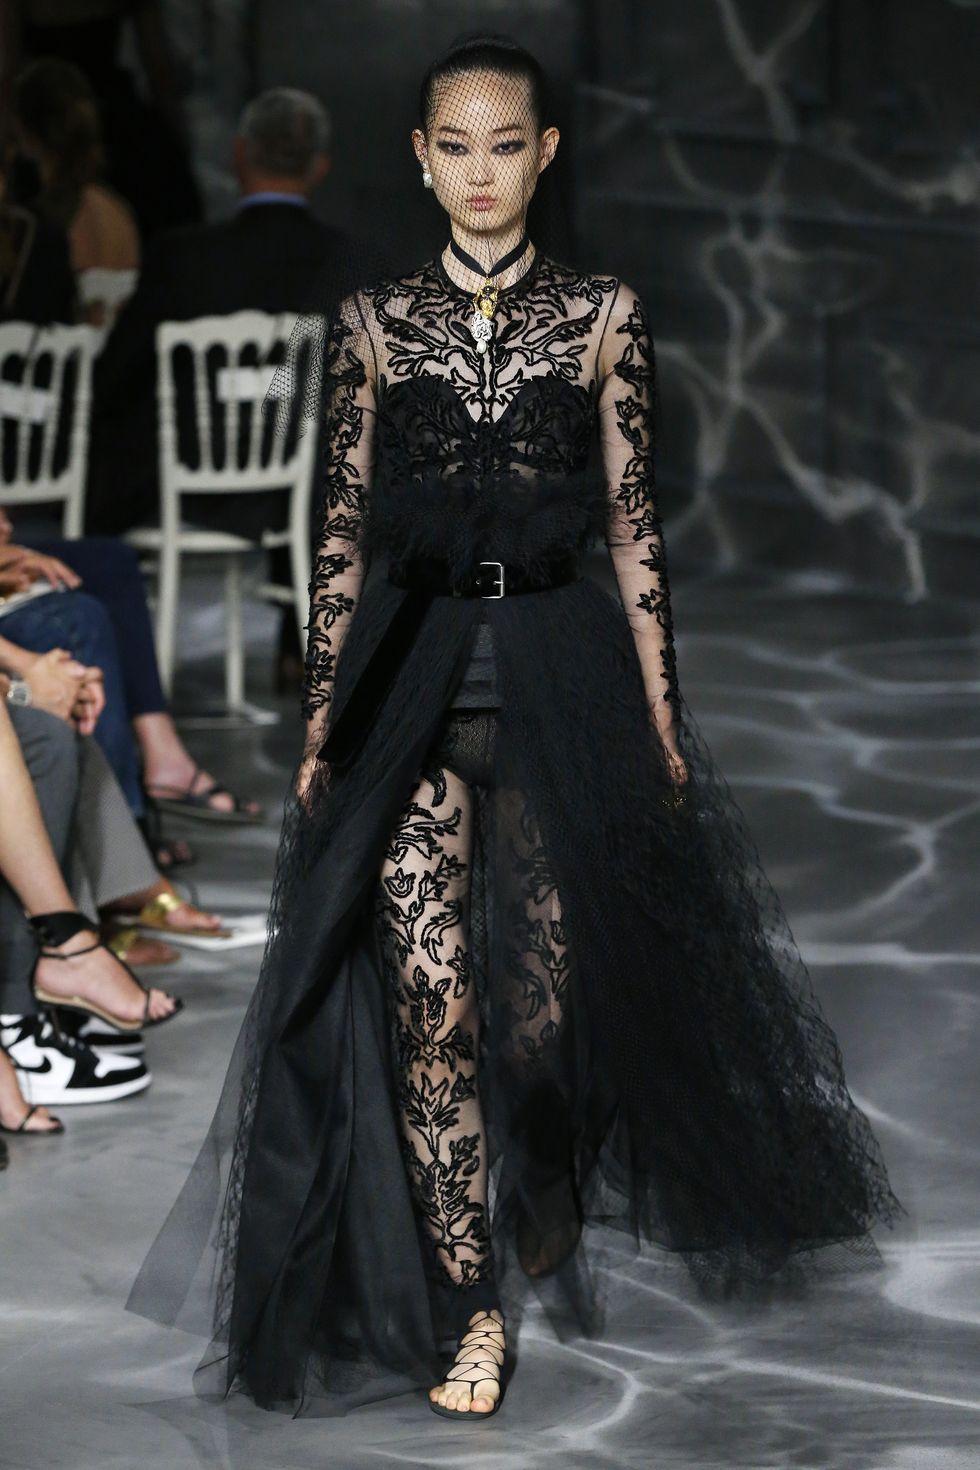 Selain itu, gaun hitam dengan balutan bulu indah menjadi ciri khas dari desain Christian Dior.